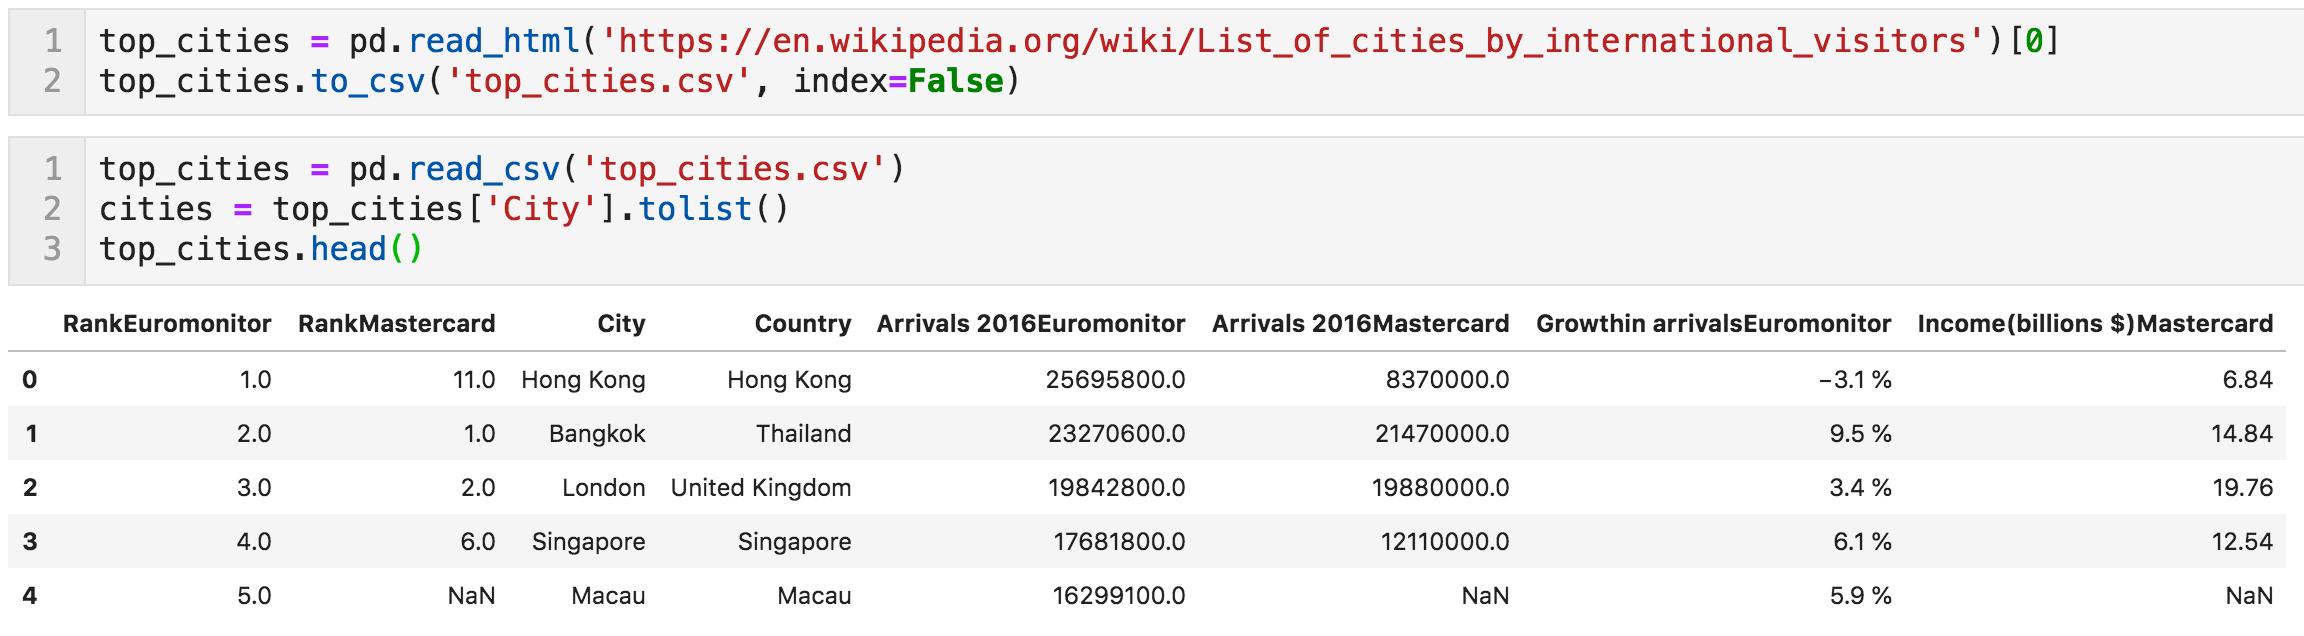 Wikipedia top cities list